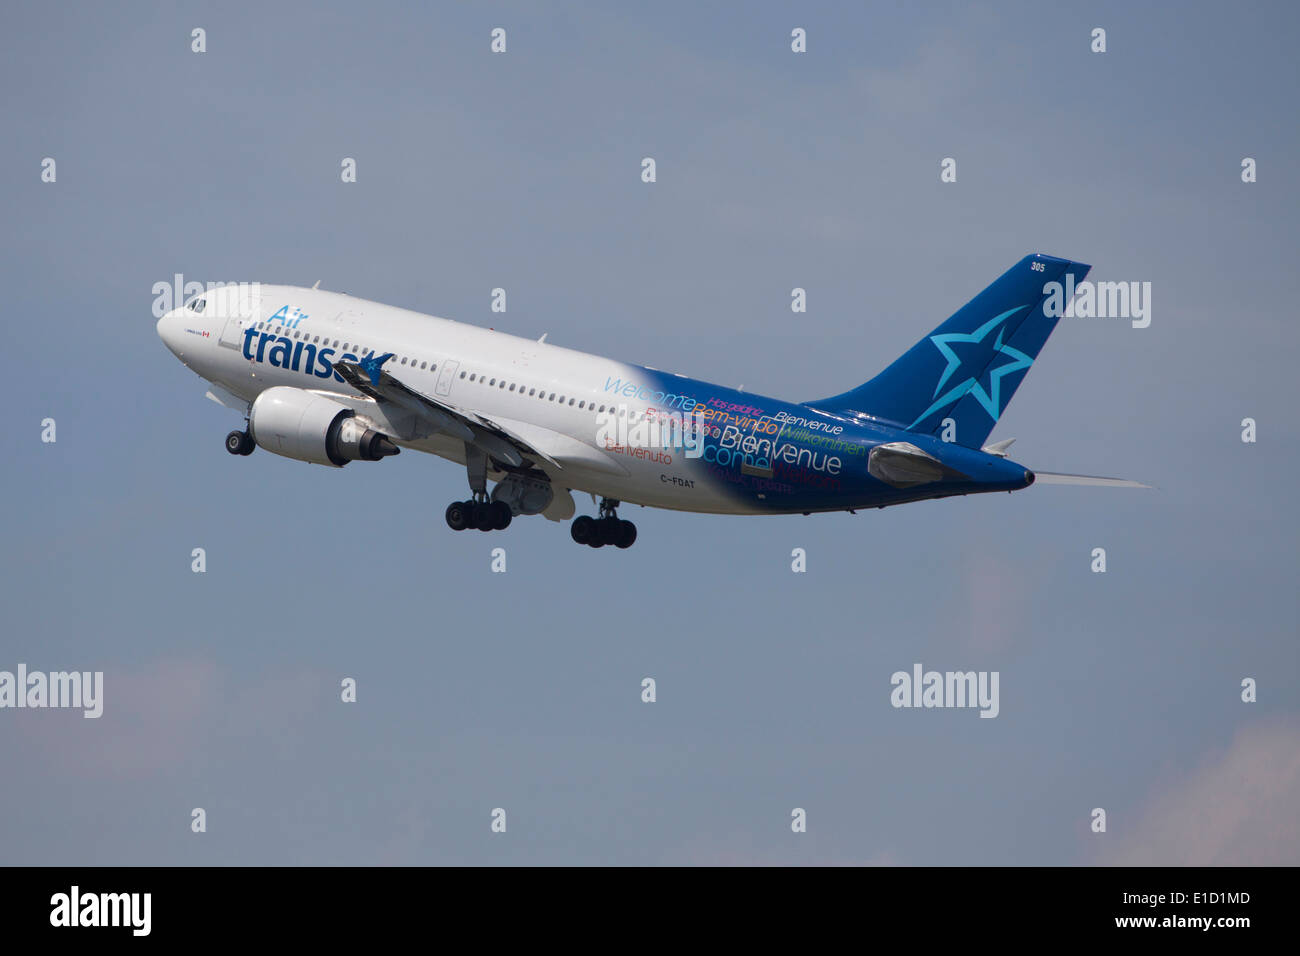 Air Transat Canadian Airlines Airbus A310 300 Ausziehen Stockfoto